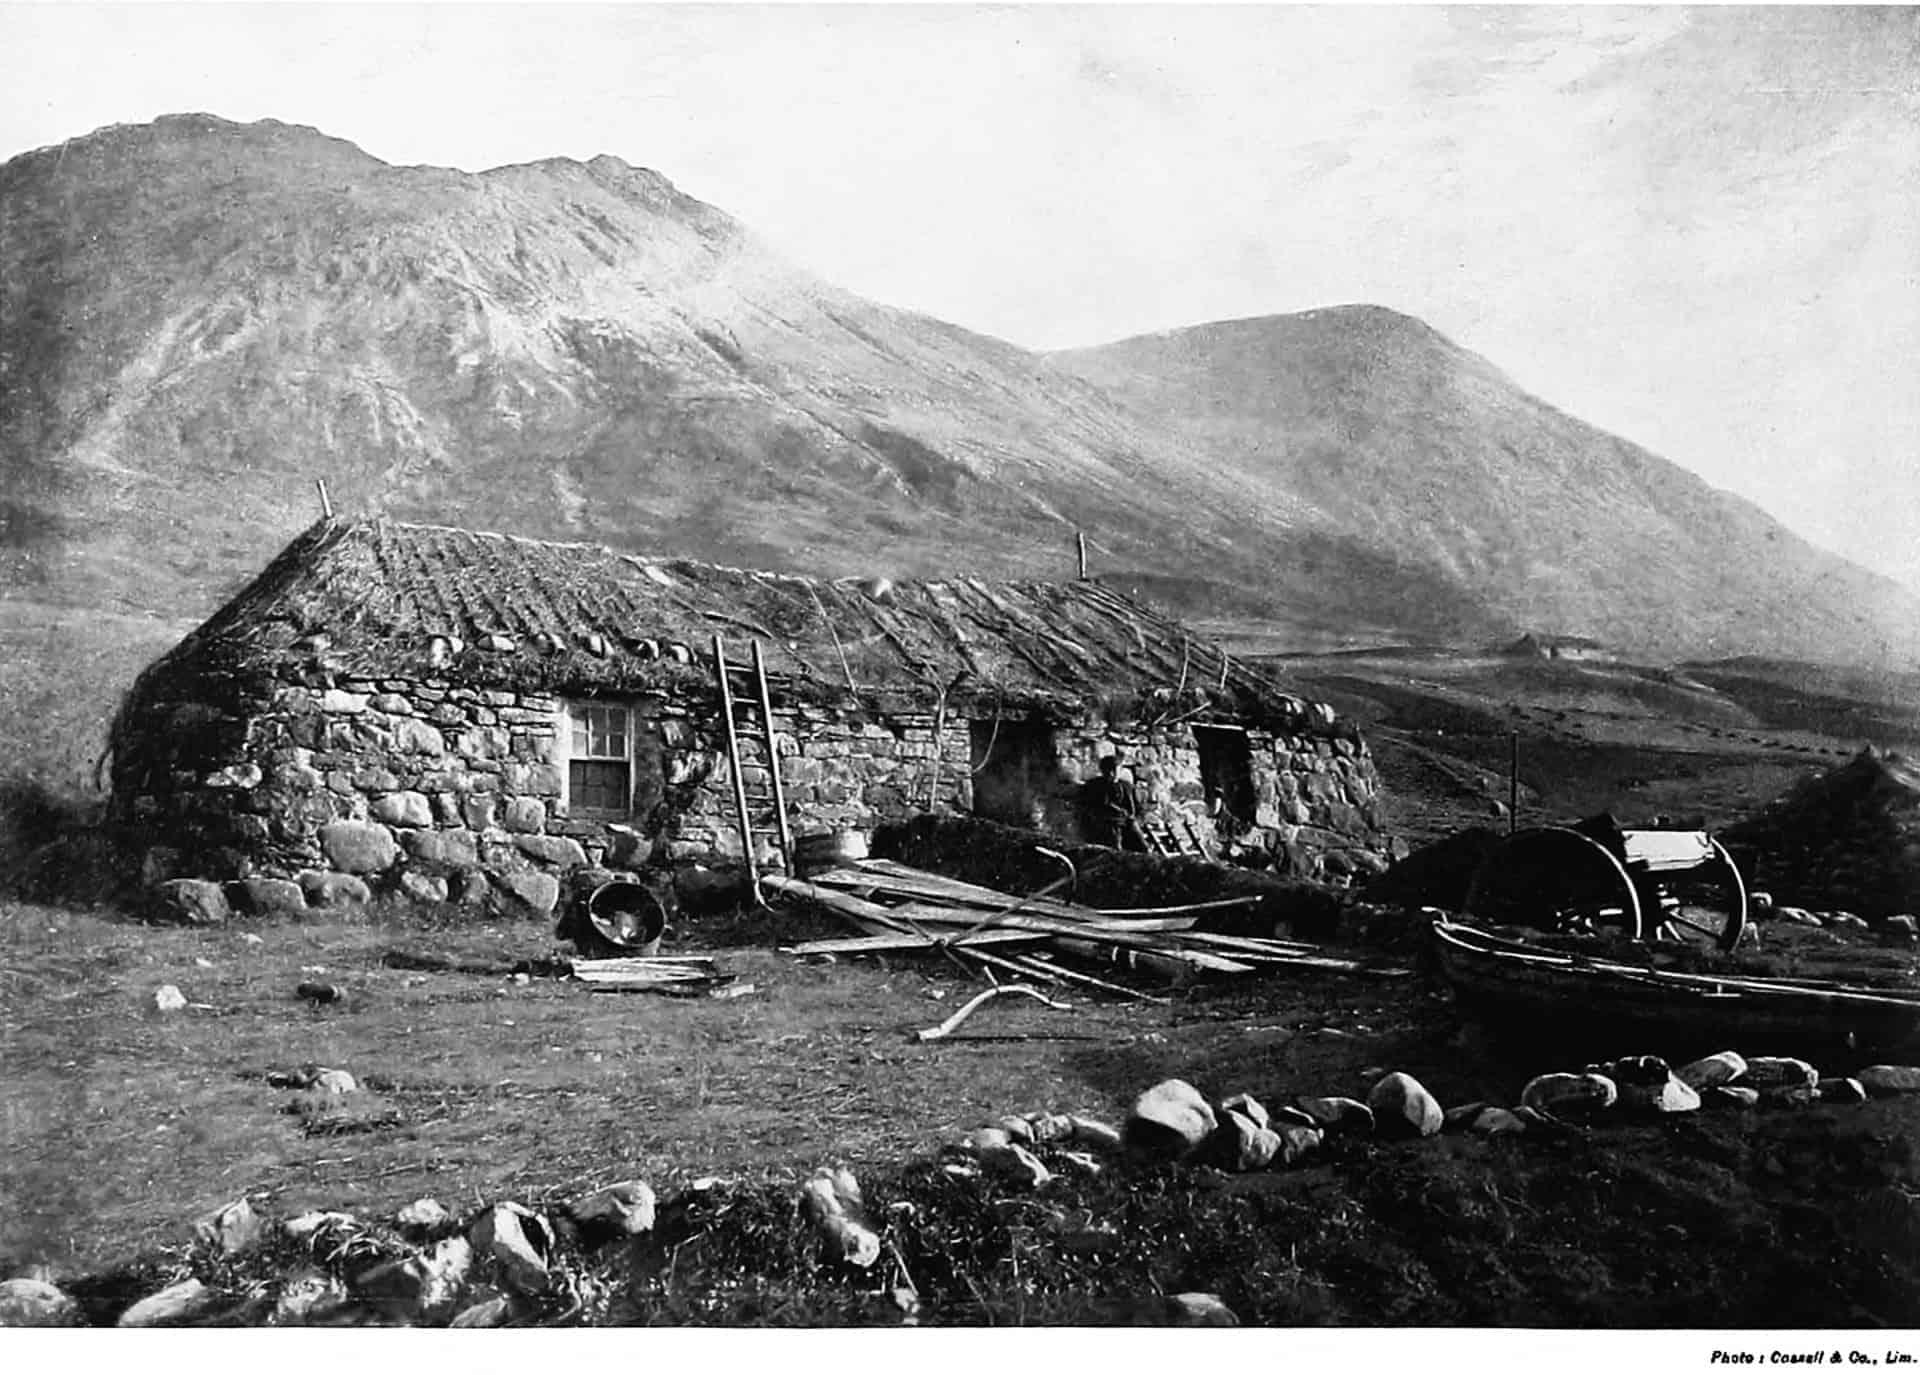 A crofter's home in the Isle of Skye, Scotland